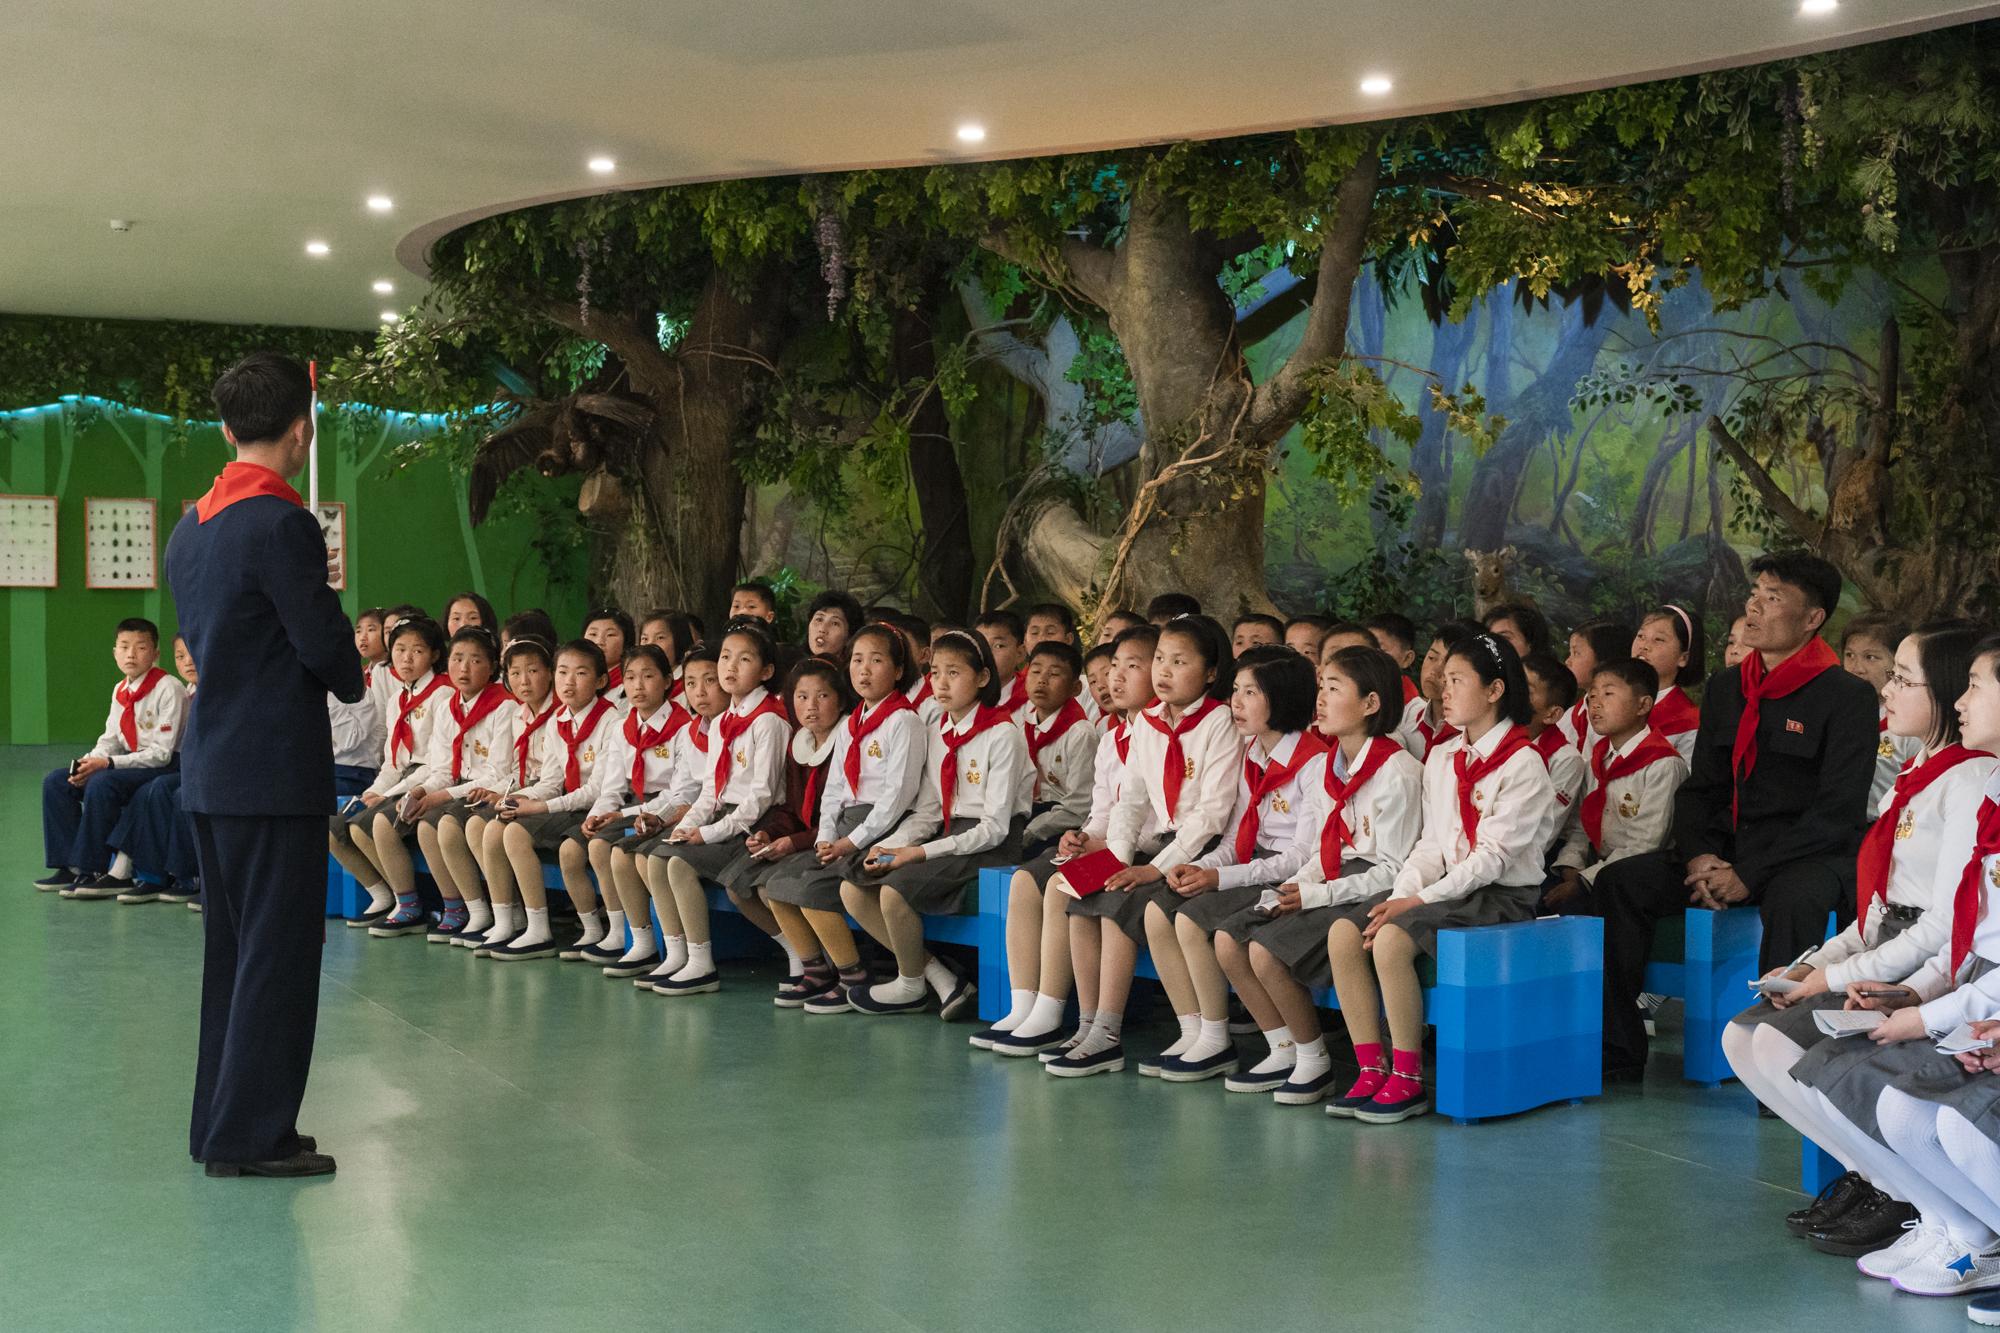 NorthKorea_160419_SNY2645_Web.jpg